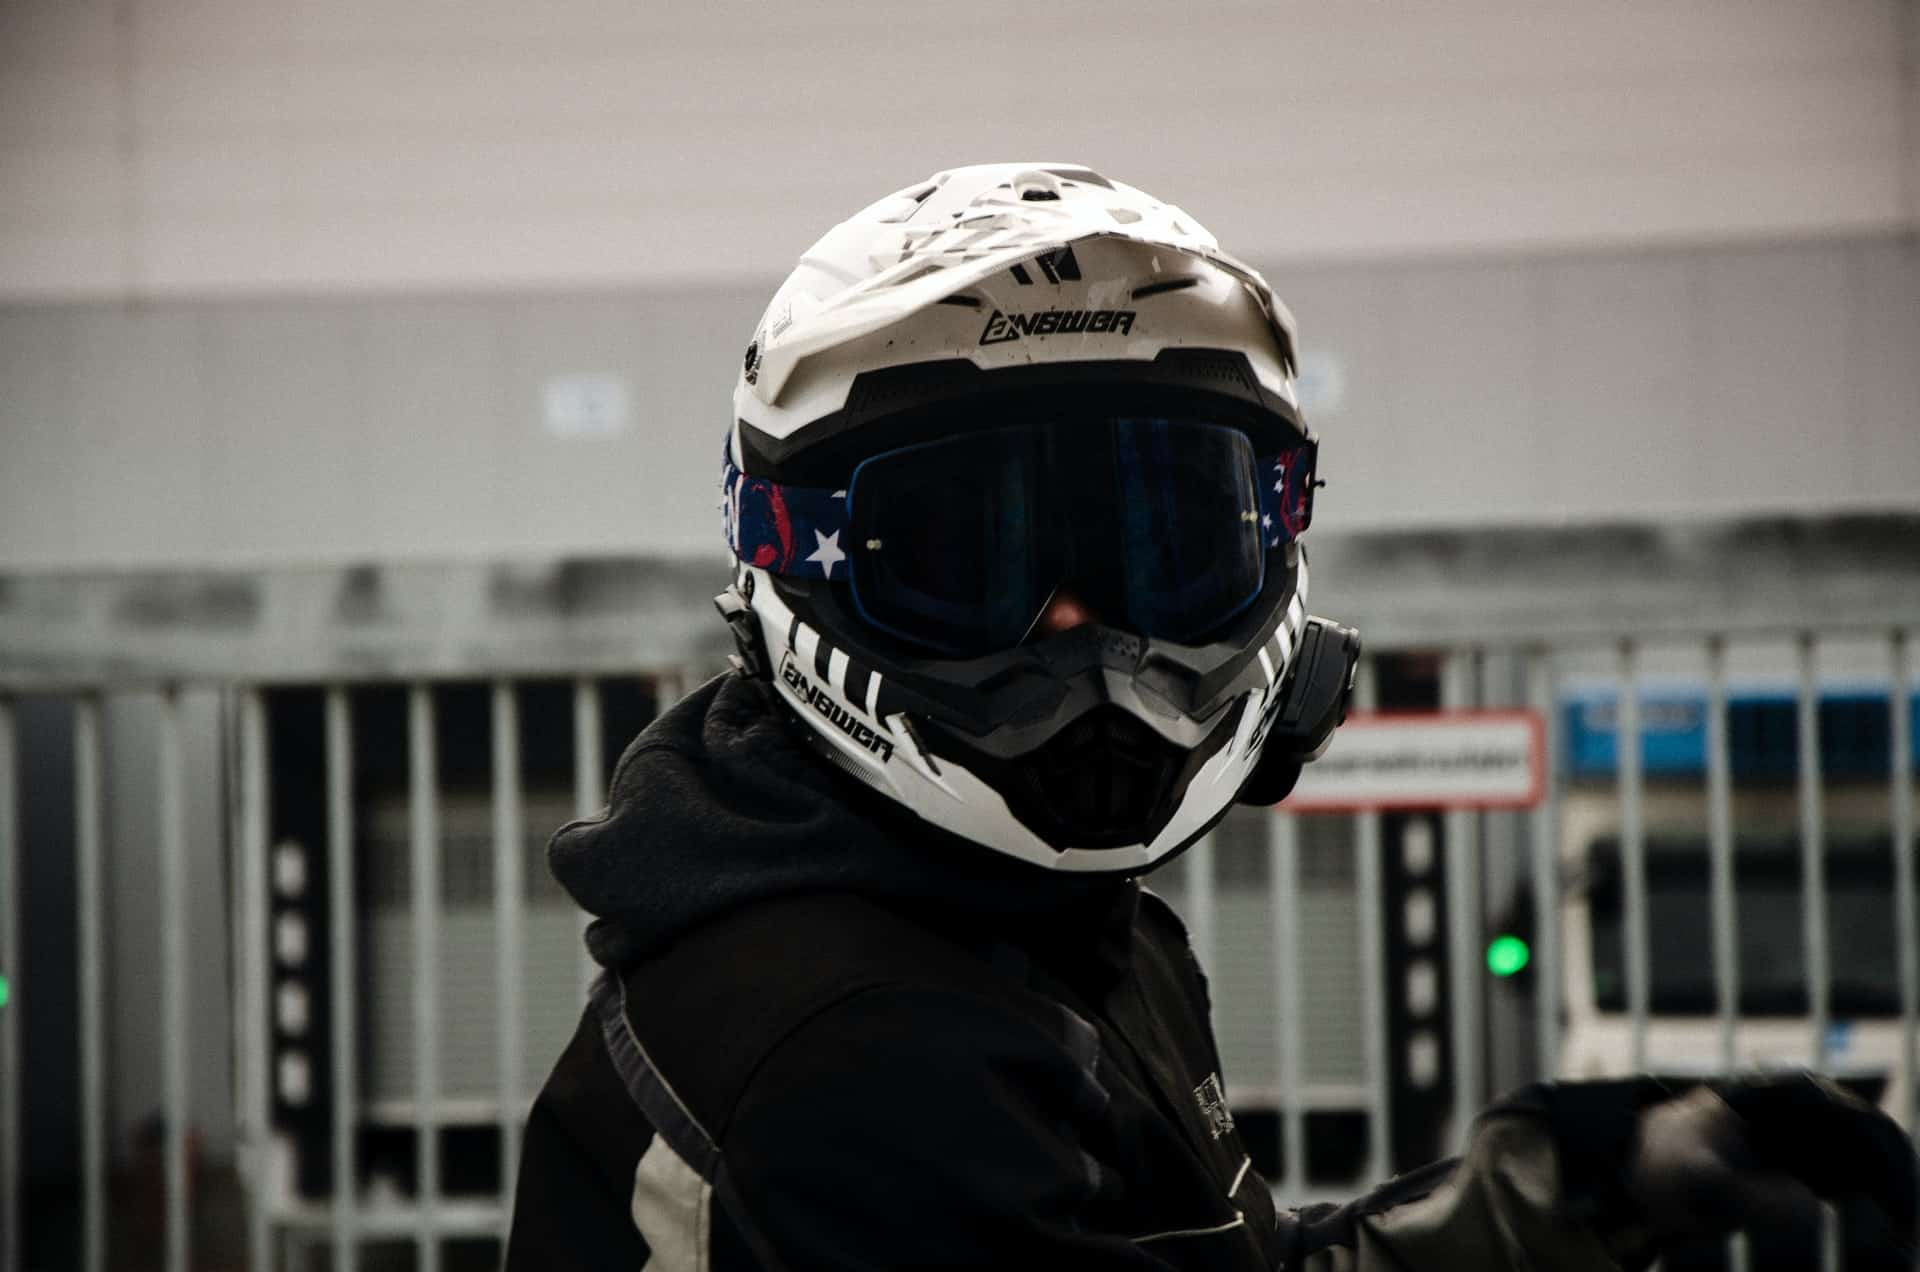 man wearing white helmet